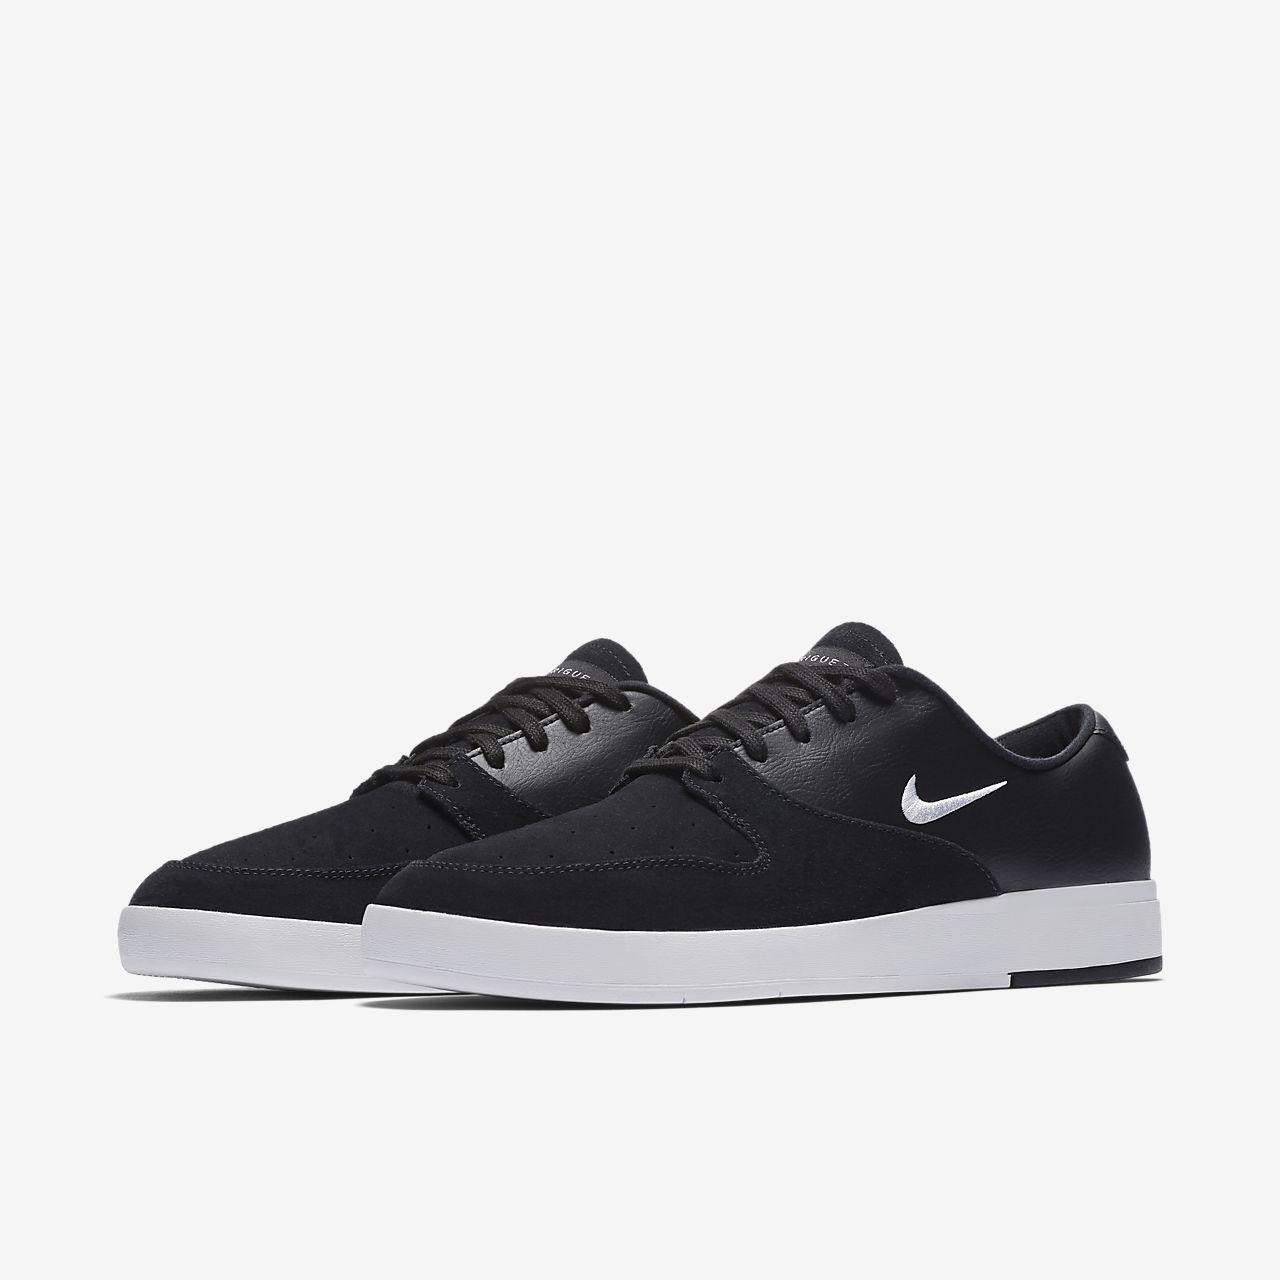 f05152bc74f6 Nike SB Zoom Paul Rodriguez Ten Men s Skateboarding Shoe